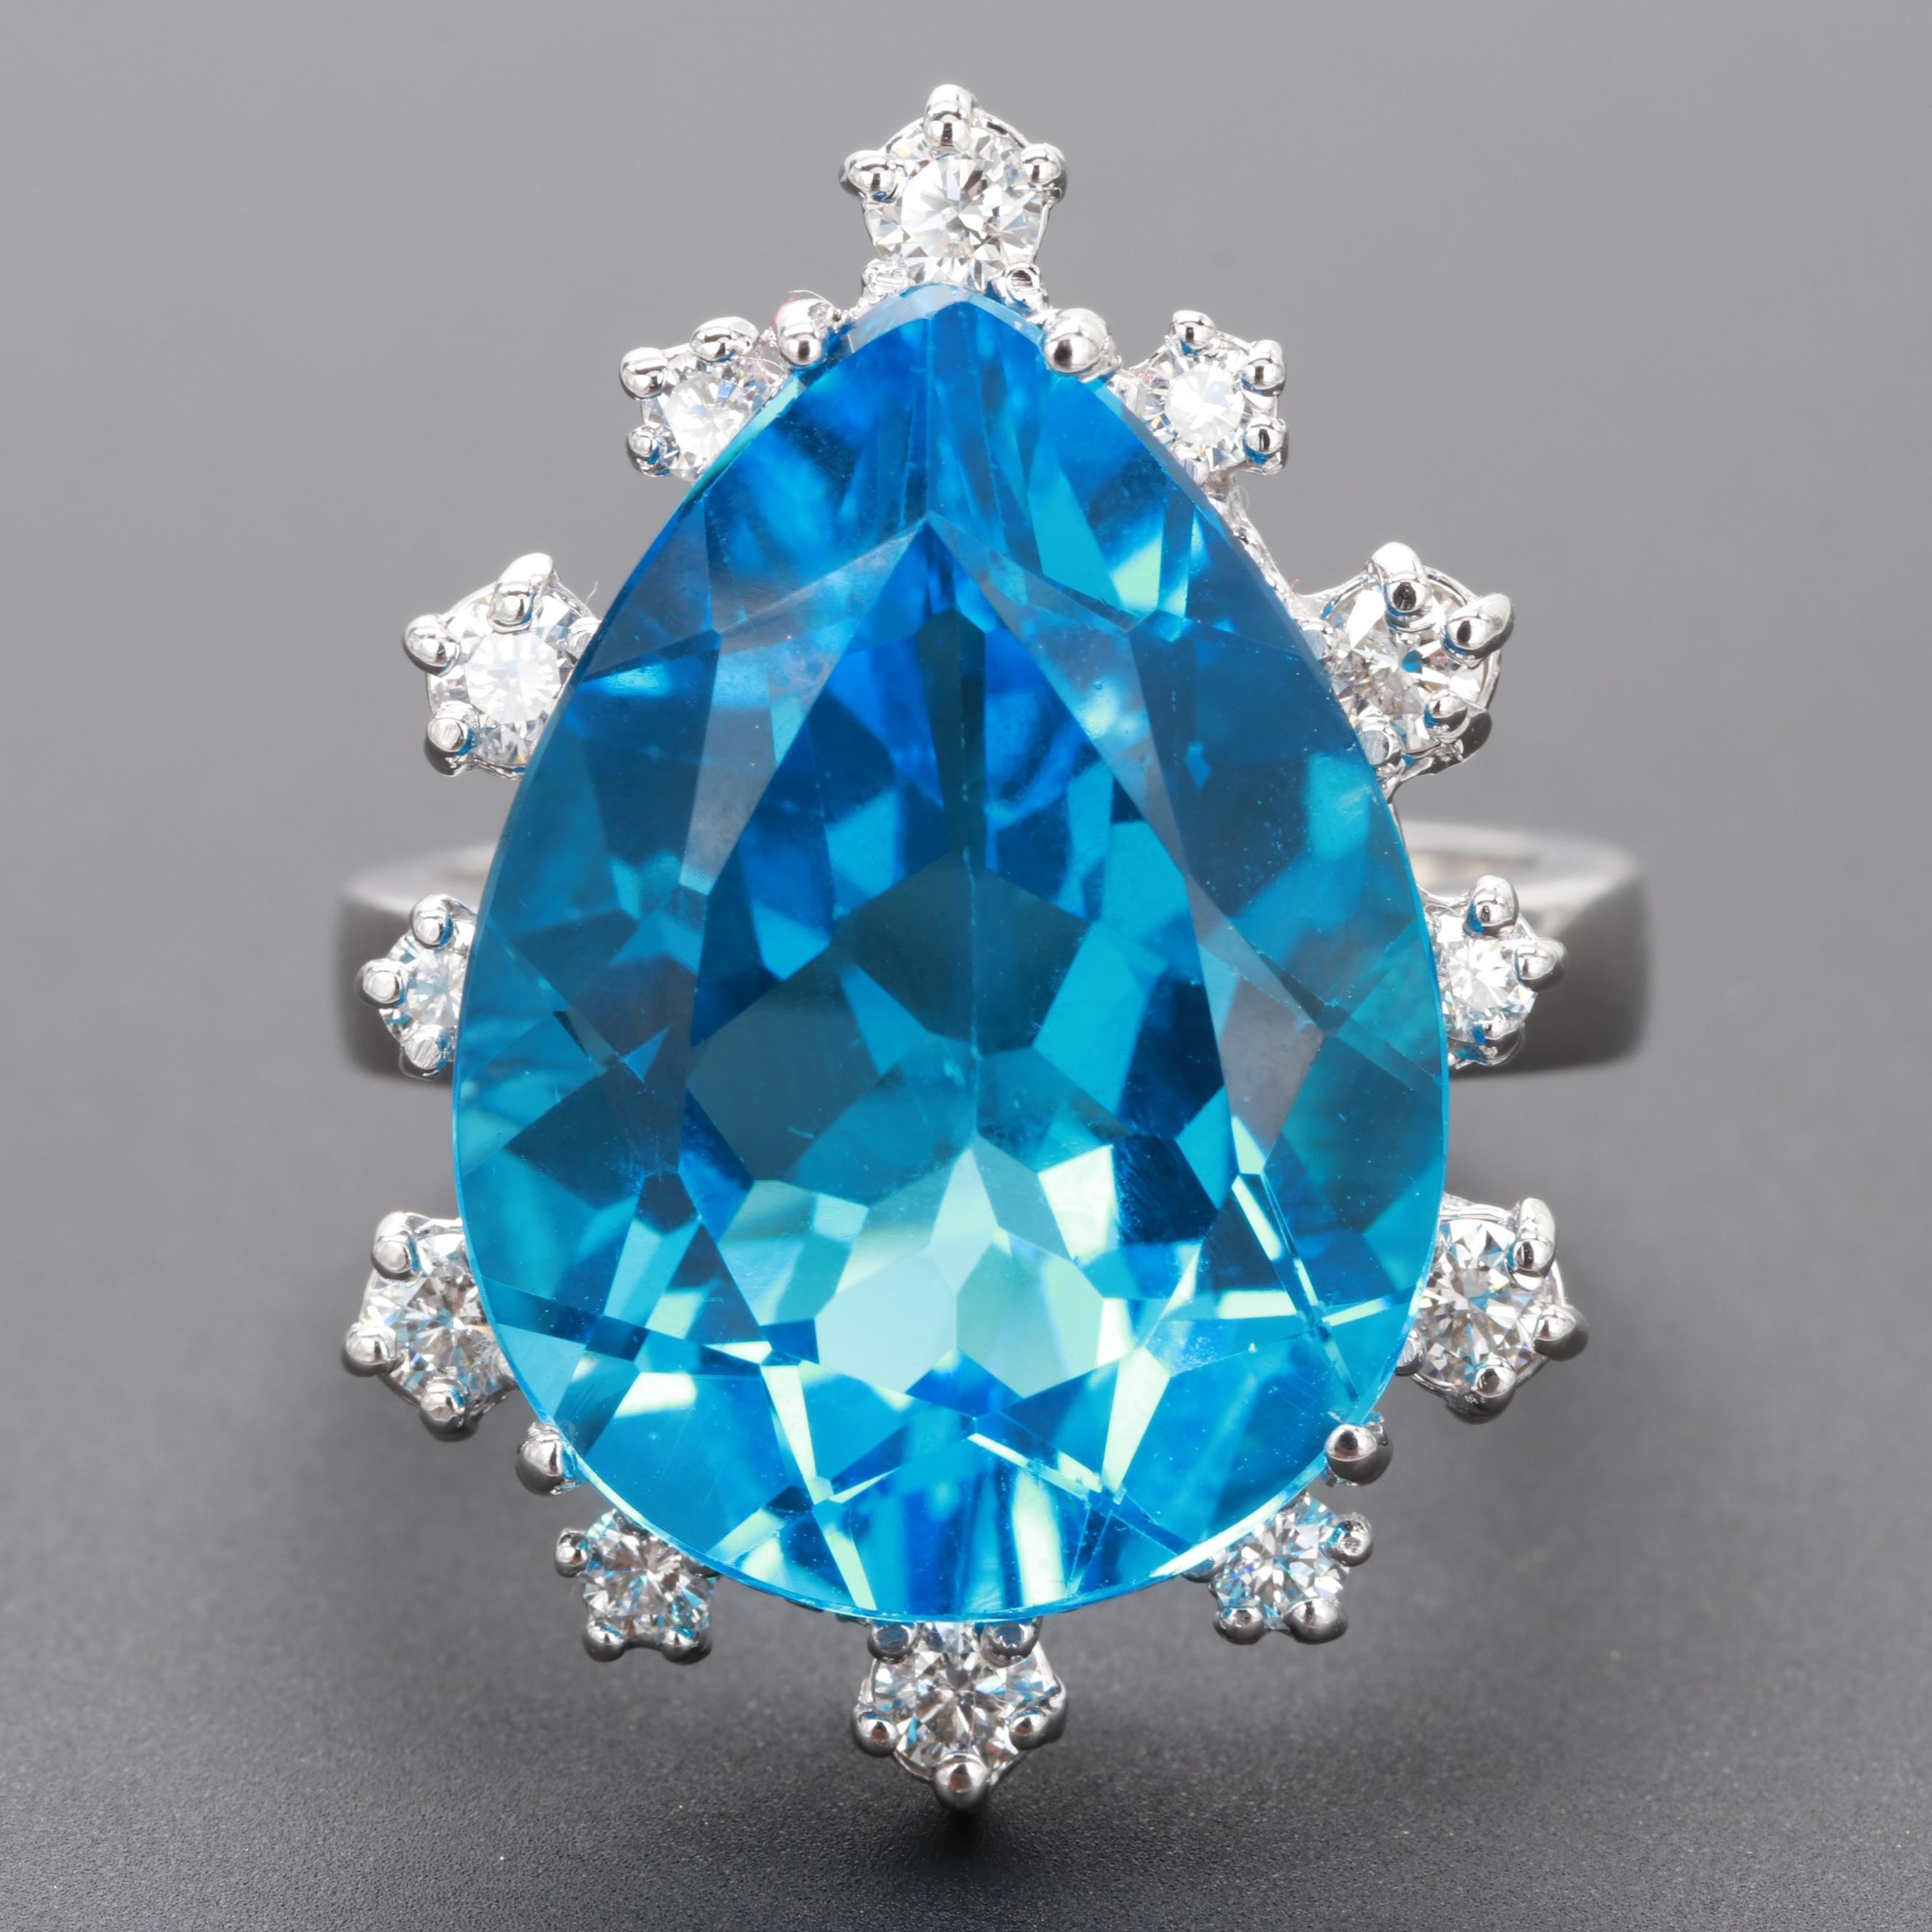 14K White Gold 16.41 CT Blue Topaz and Diamond Ring